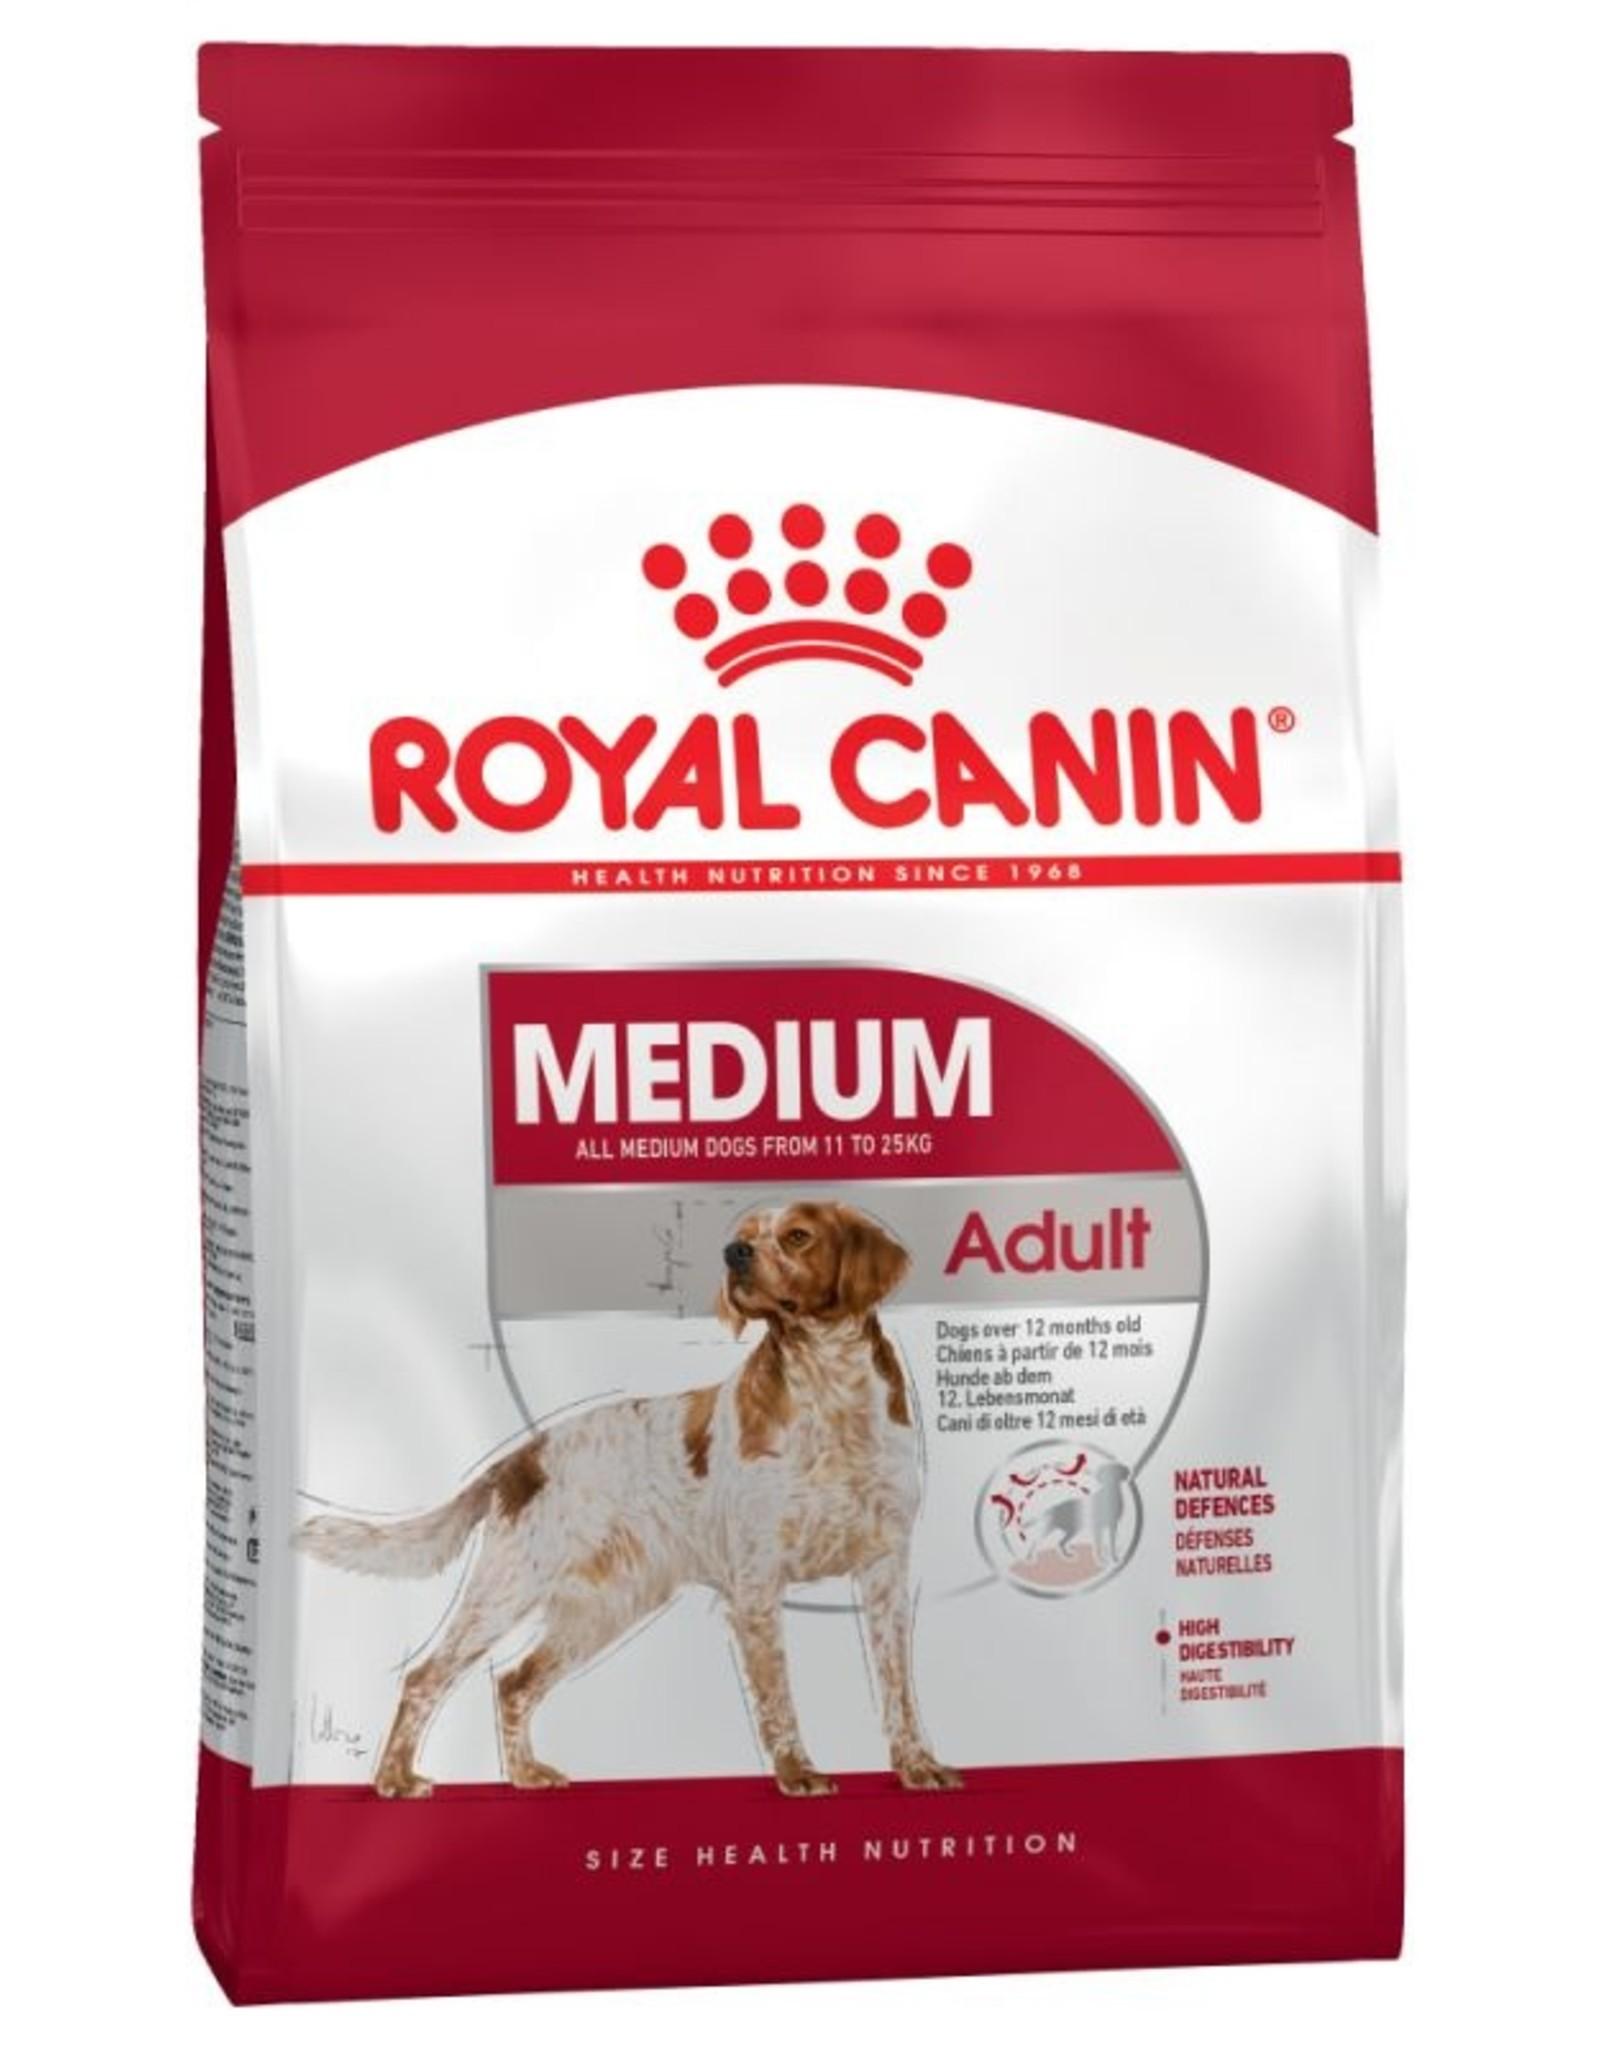 Royal Canin Royal Canin Shn Medium Adult Chien 15kg